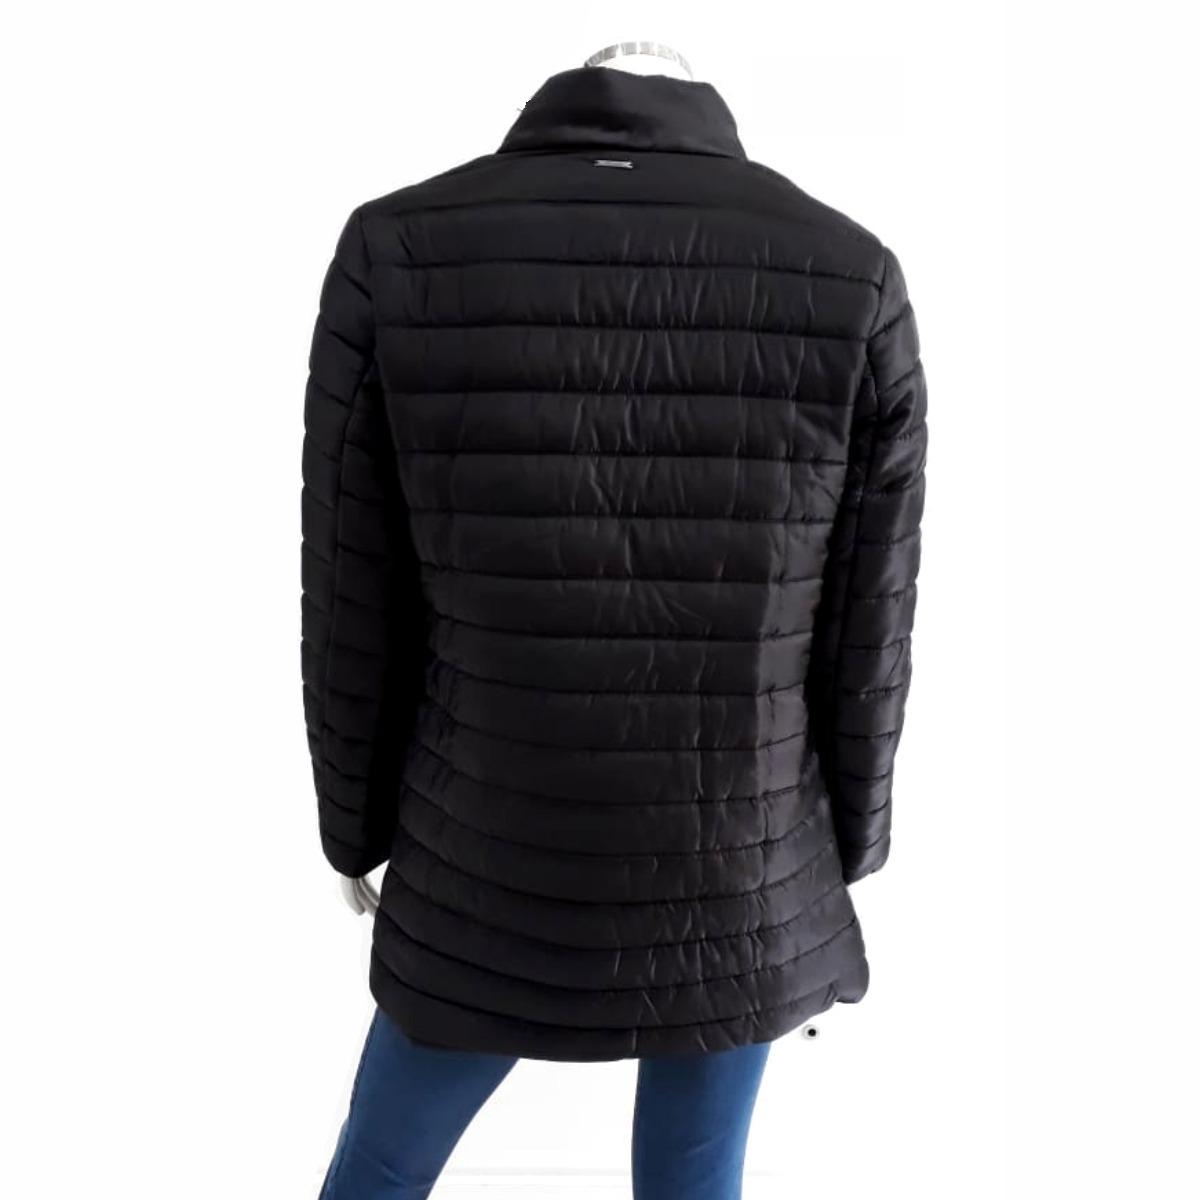 a3c252186 Jaqueta Feminina Colcci 320101412 - Original - R$ 569,90 em Mercado ...